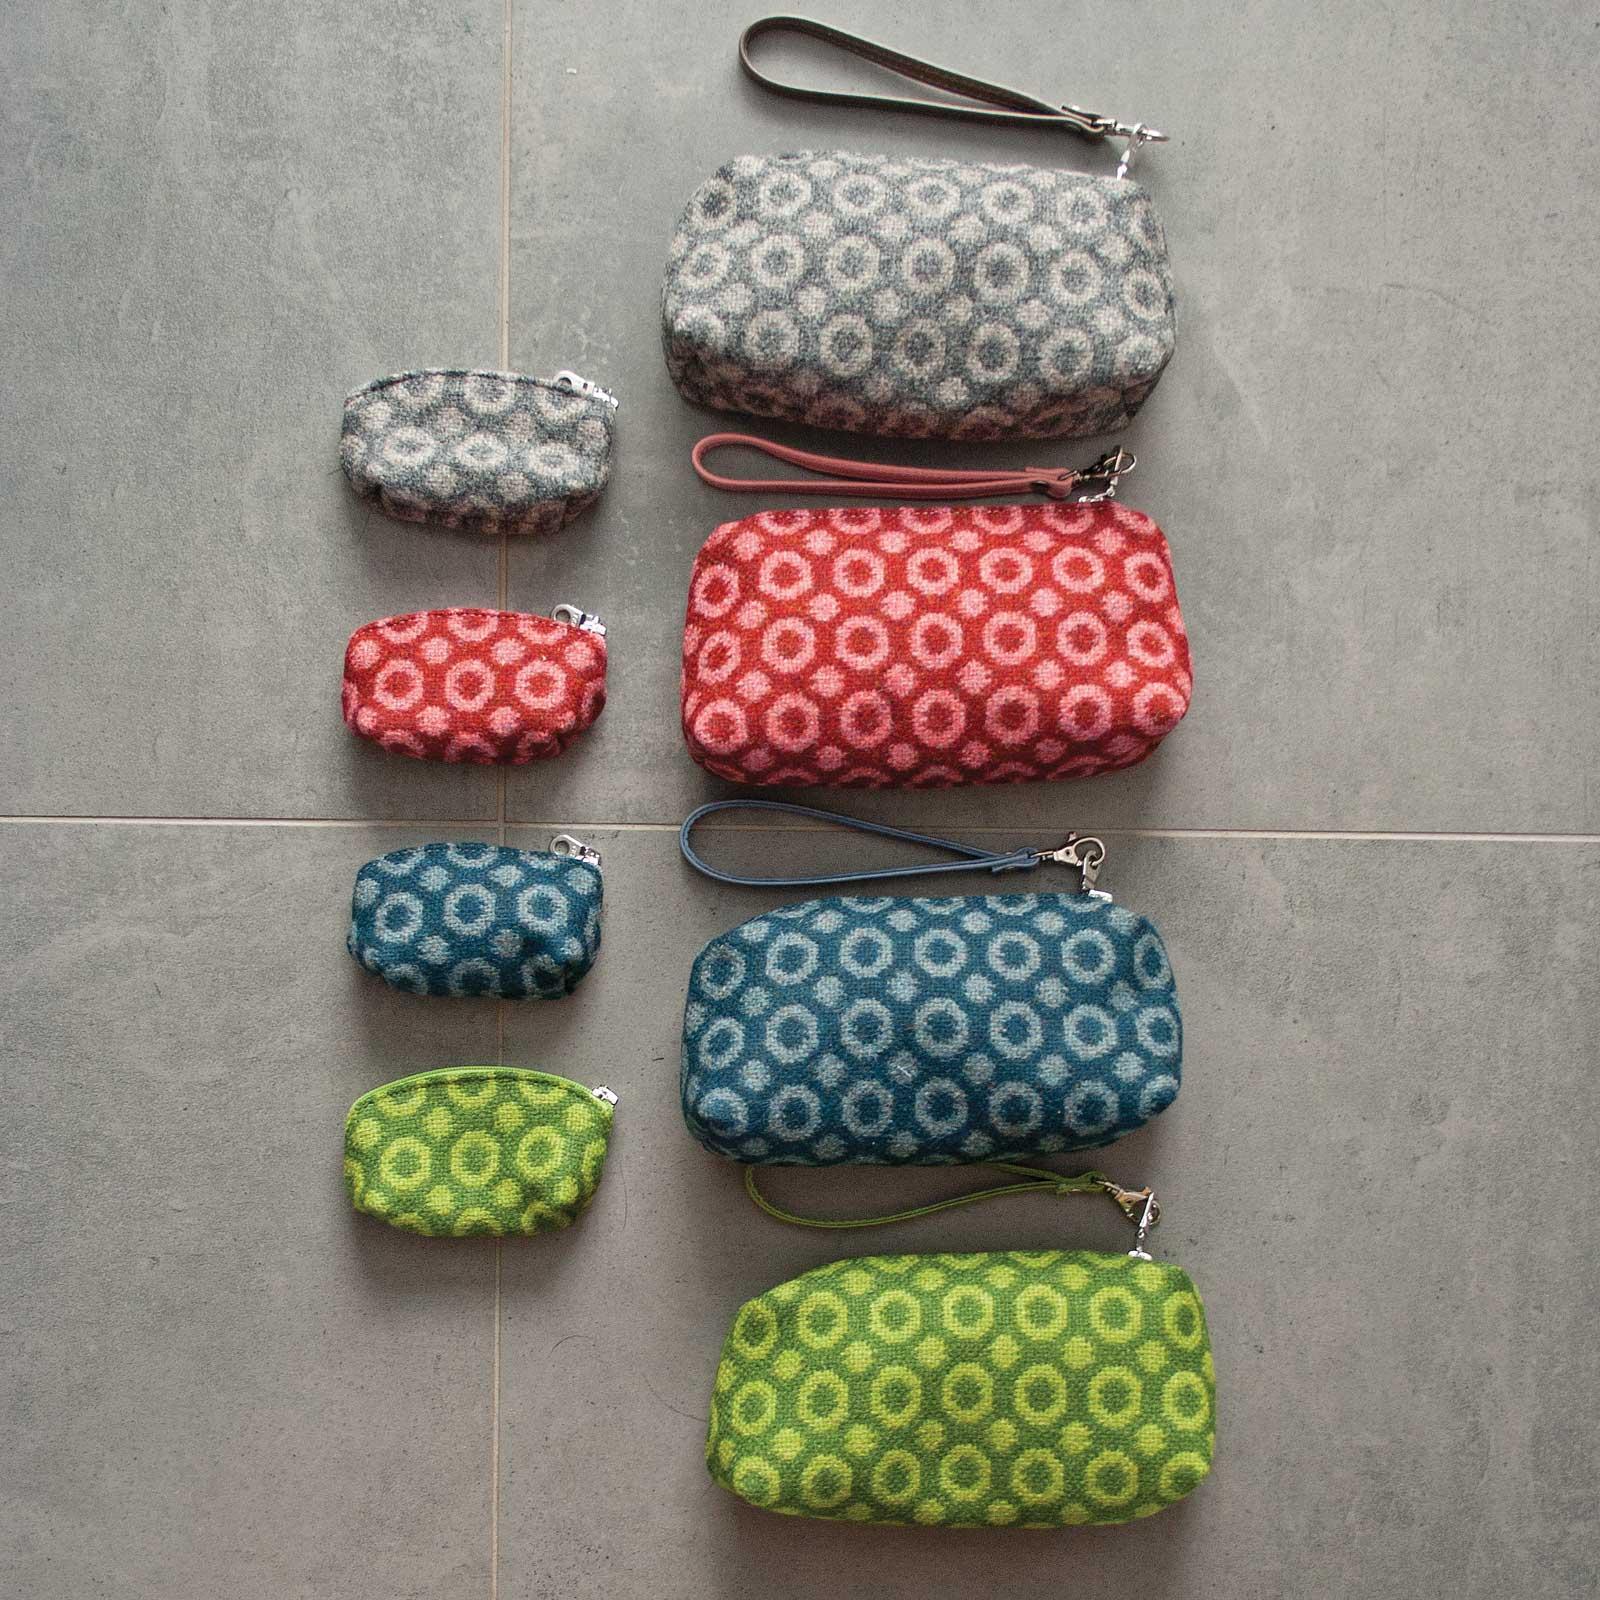 purses_7321_crop_1600.jpg